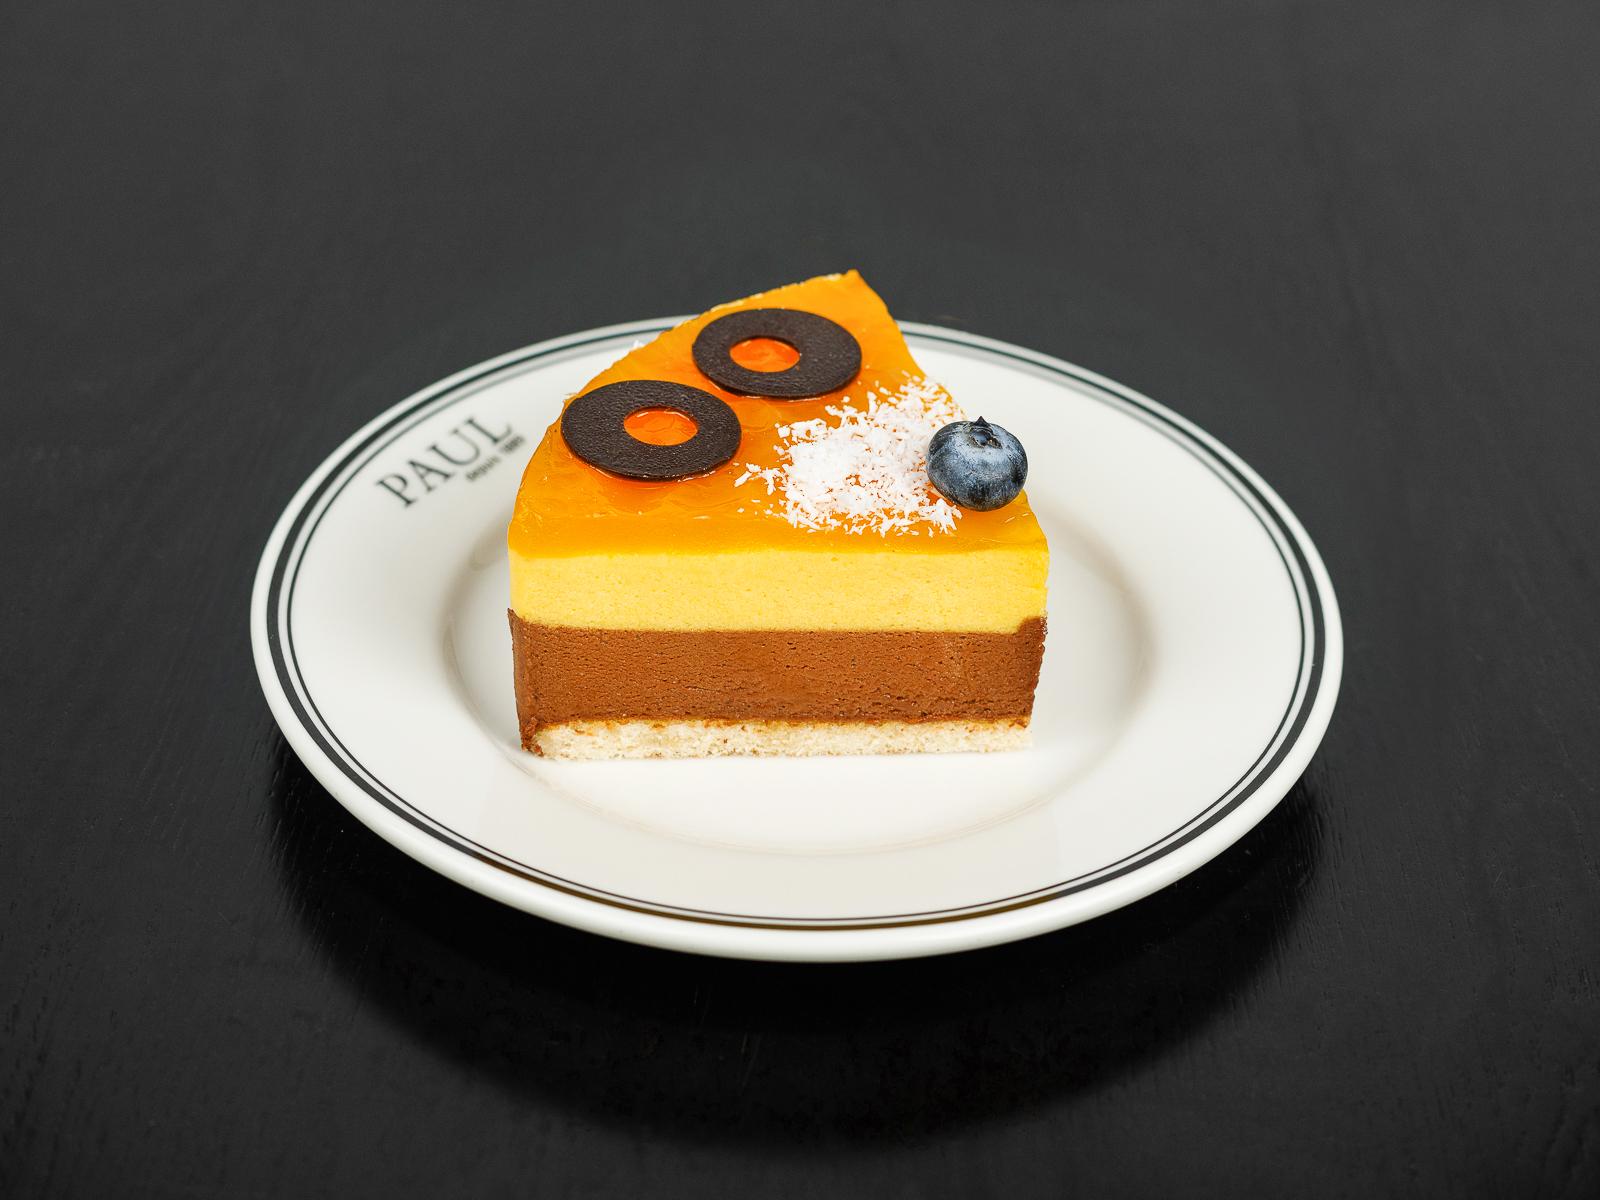 Торт Шоколад-манго (порция)